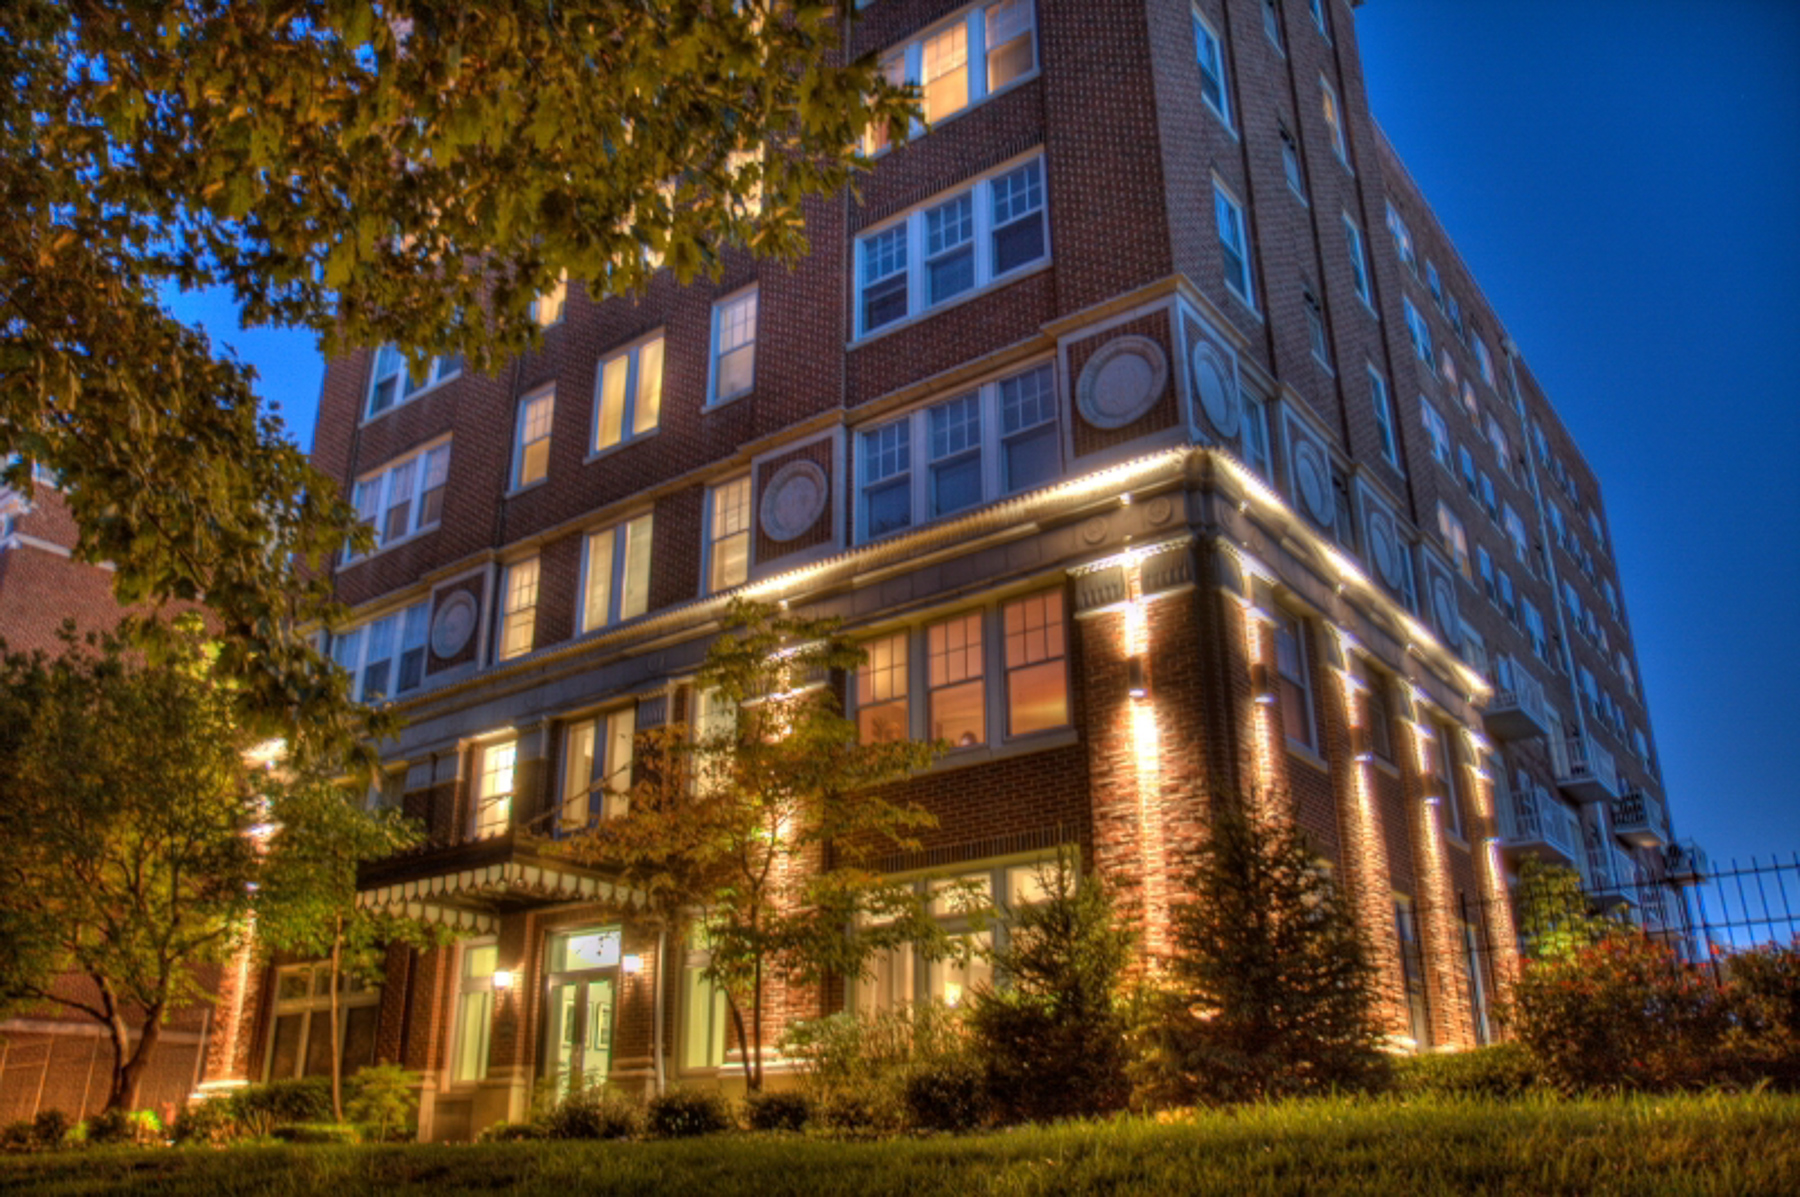 Condominium for Sale at Super Chic 2 BR Condo 5330 Pershing Ave # 502 St. Louis, Missouri, 63112 United States